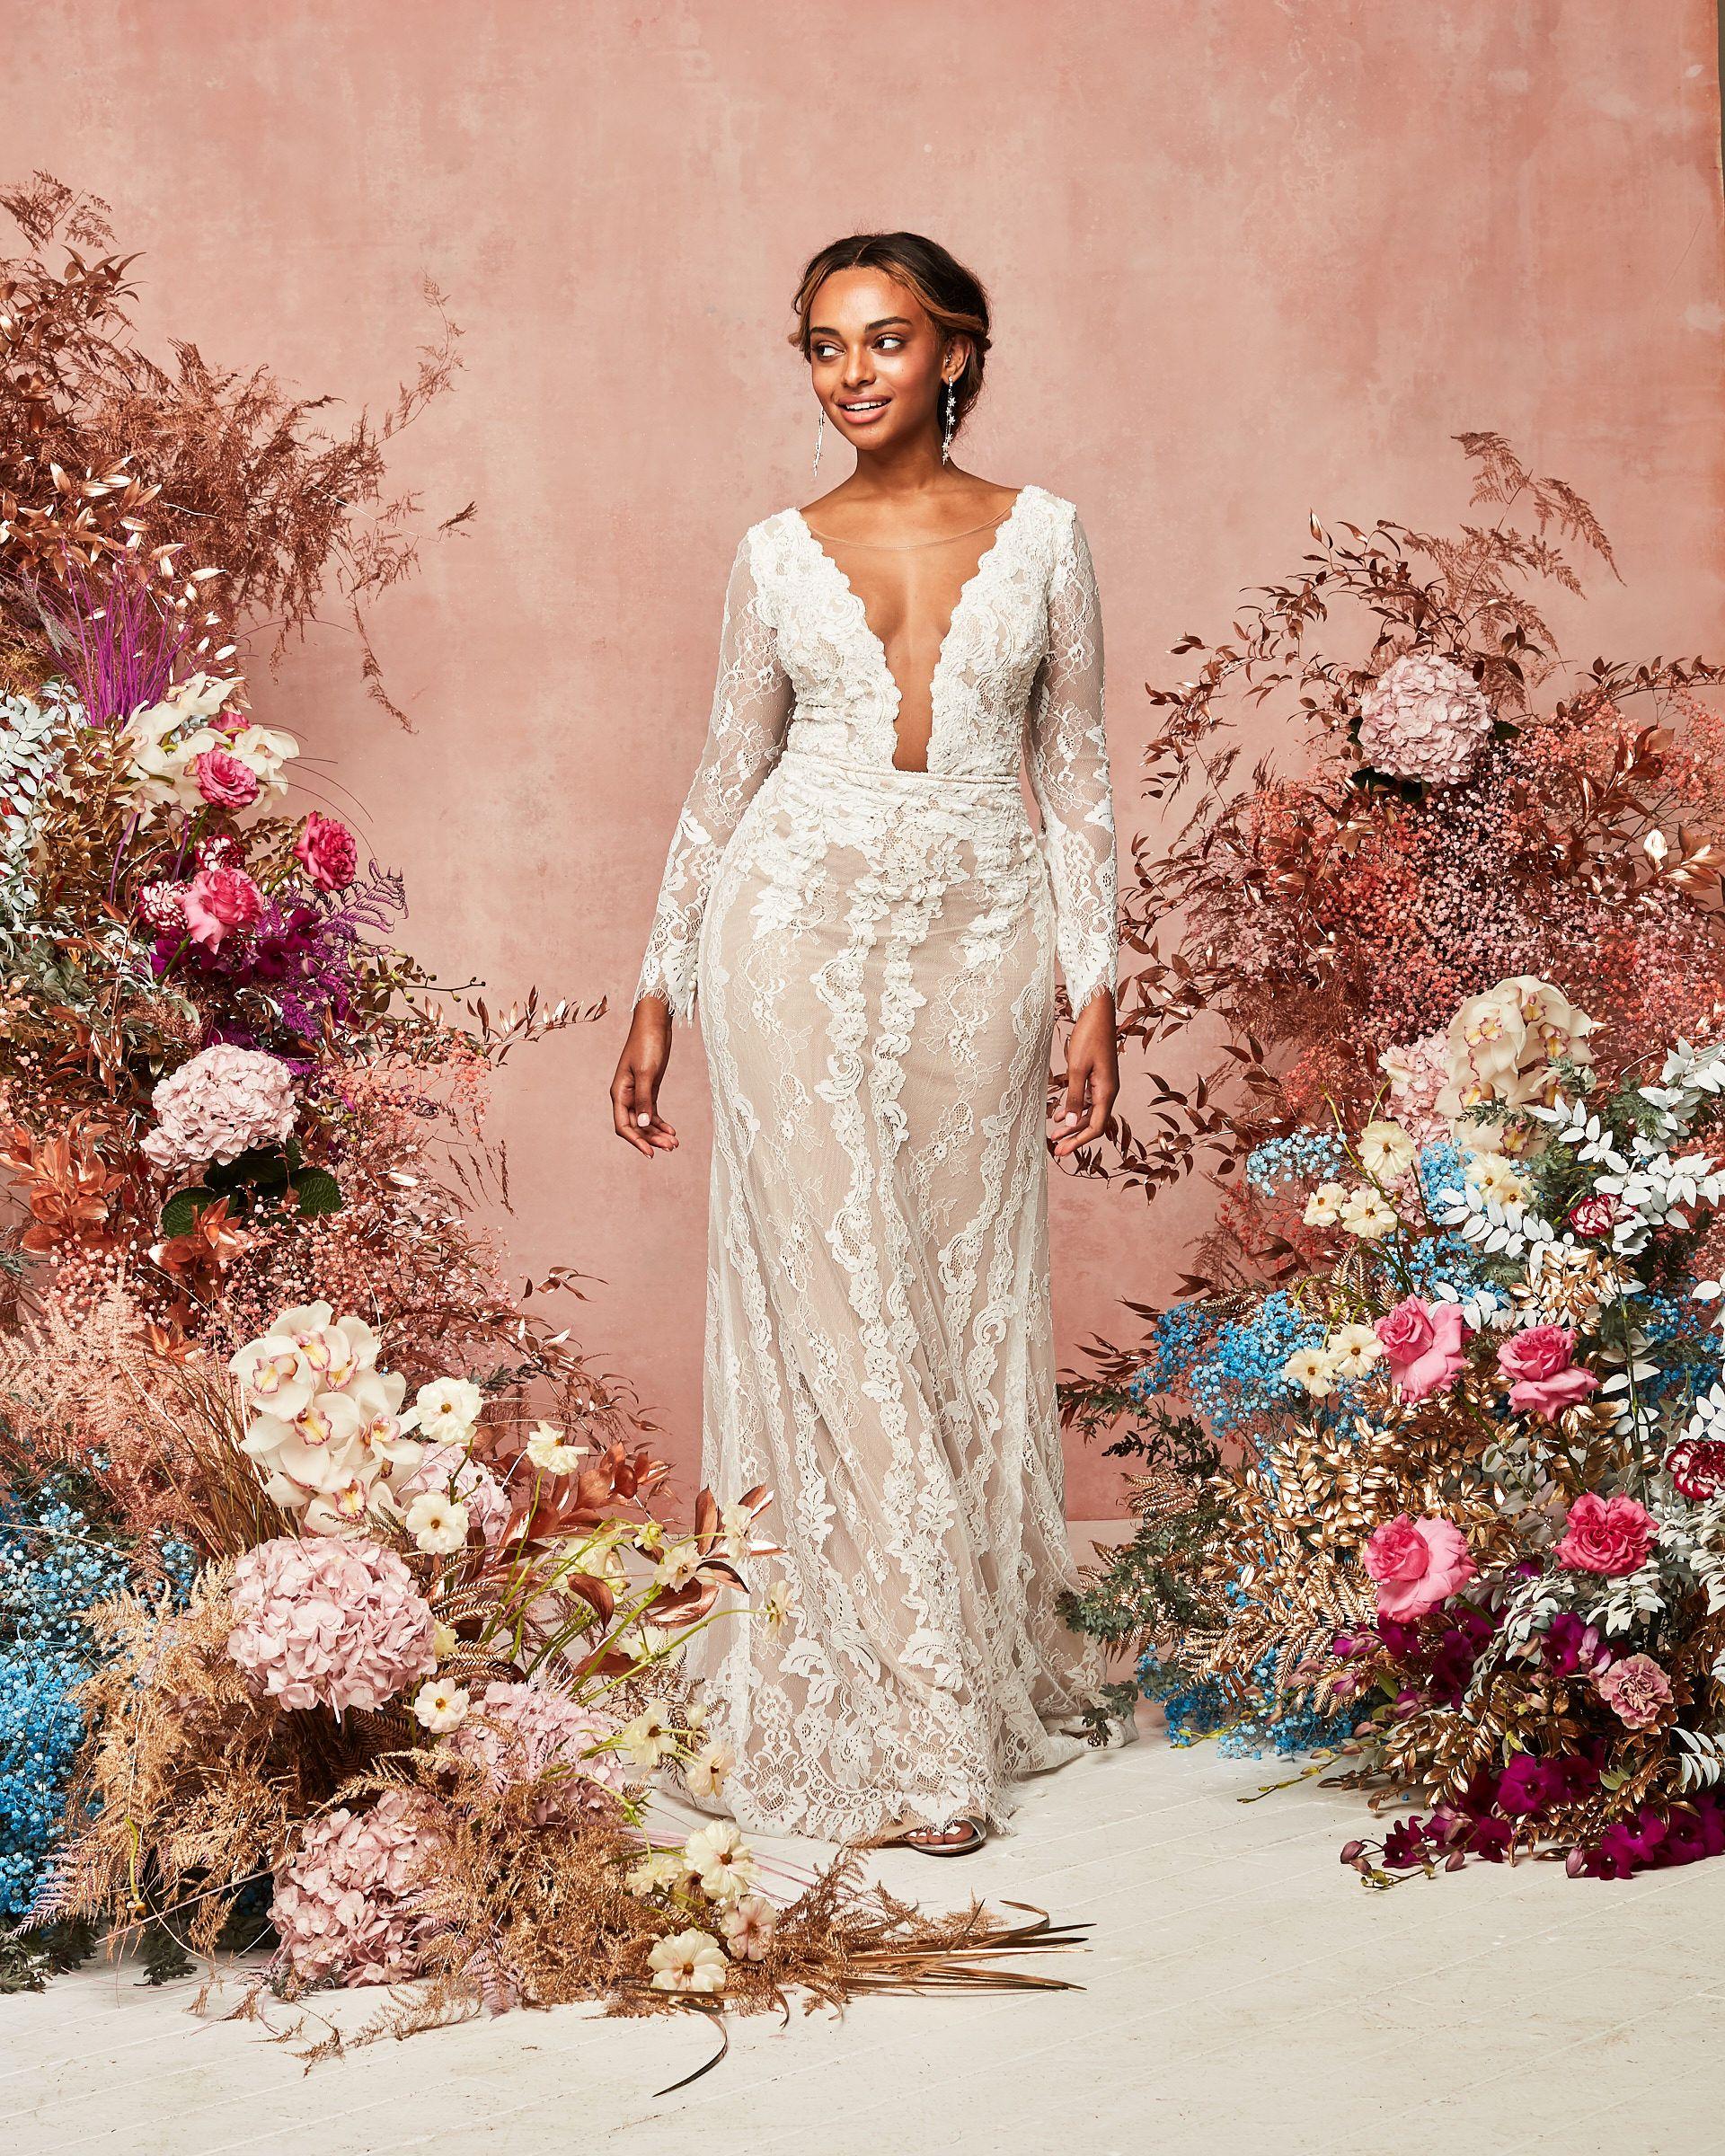 Illusion Plunge Long Sleeve Lace Wedding Dress David S Bridal In 2021 Davids Bridal Wedding Dresses Long Sleeve Wedding Dress Lace Wedding Dresses Lace [ 2400 x 1920 Pixel ]